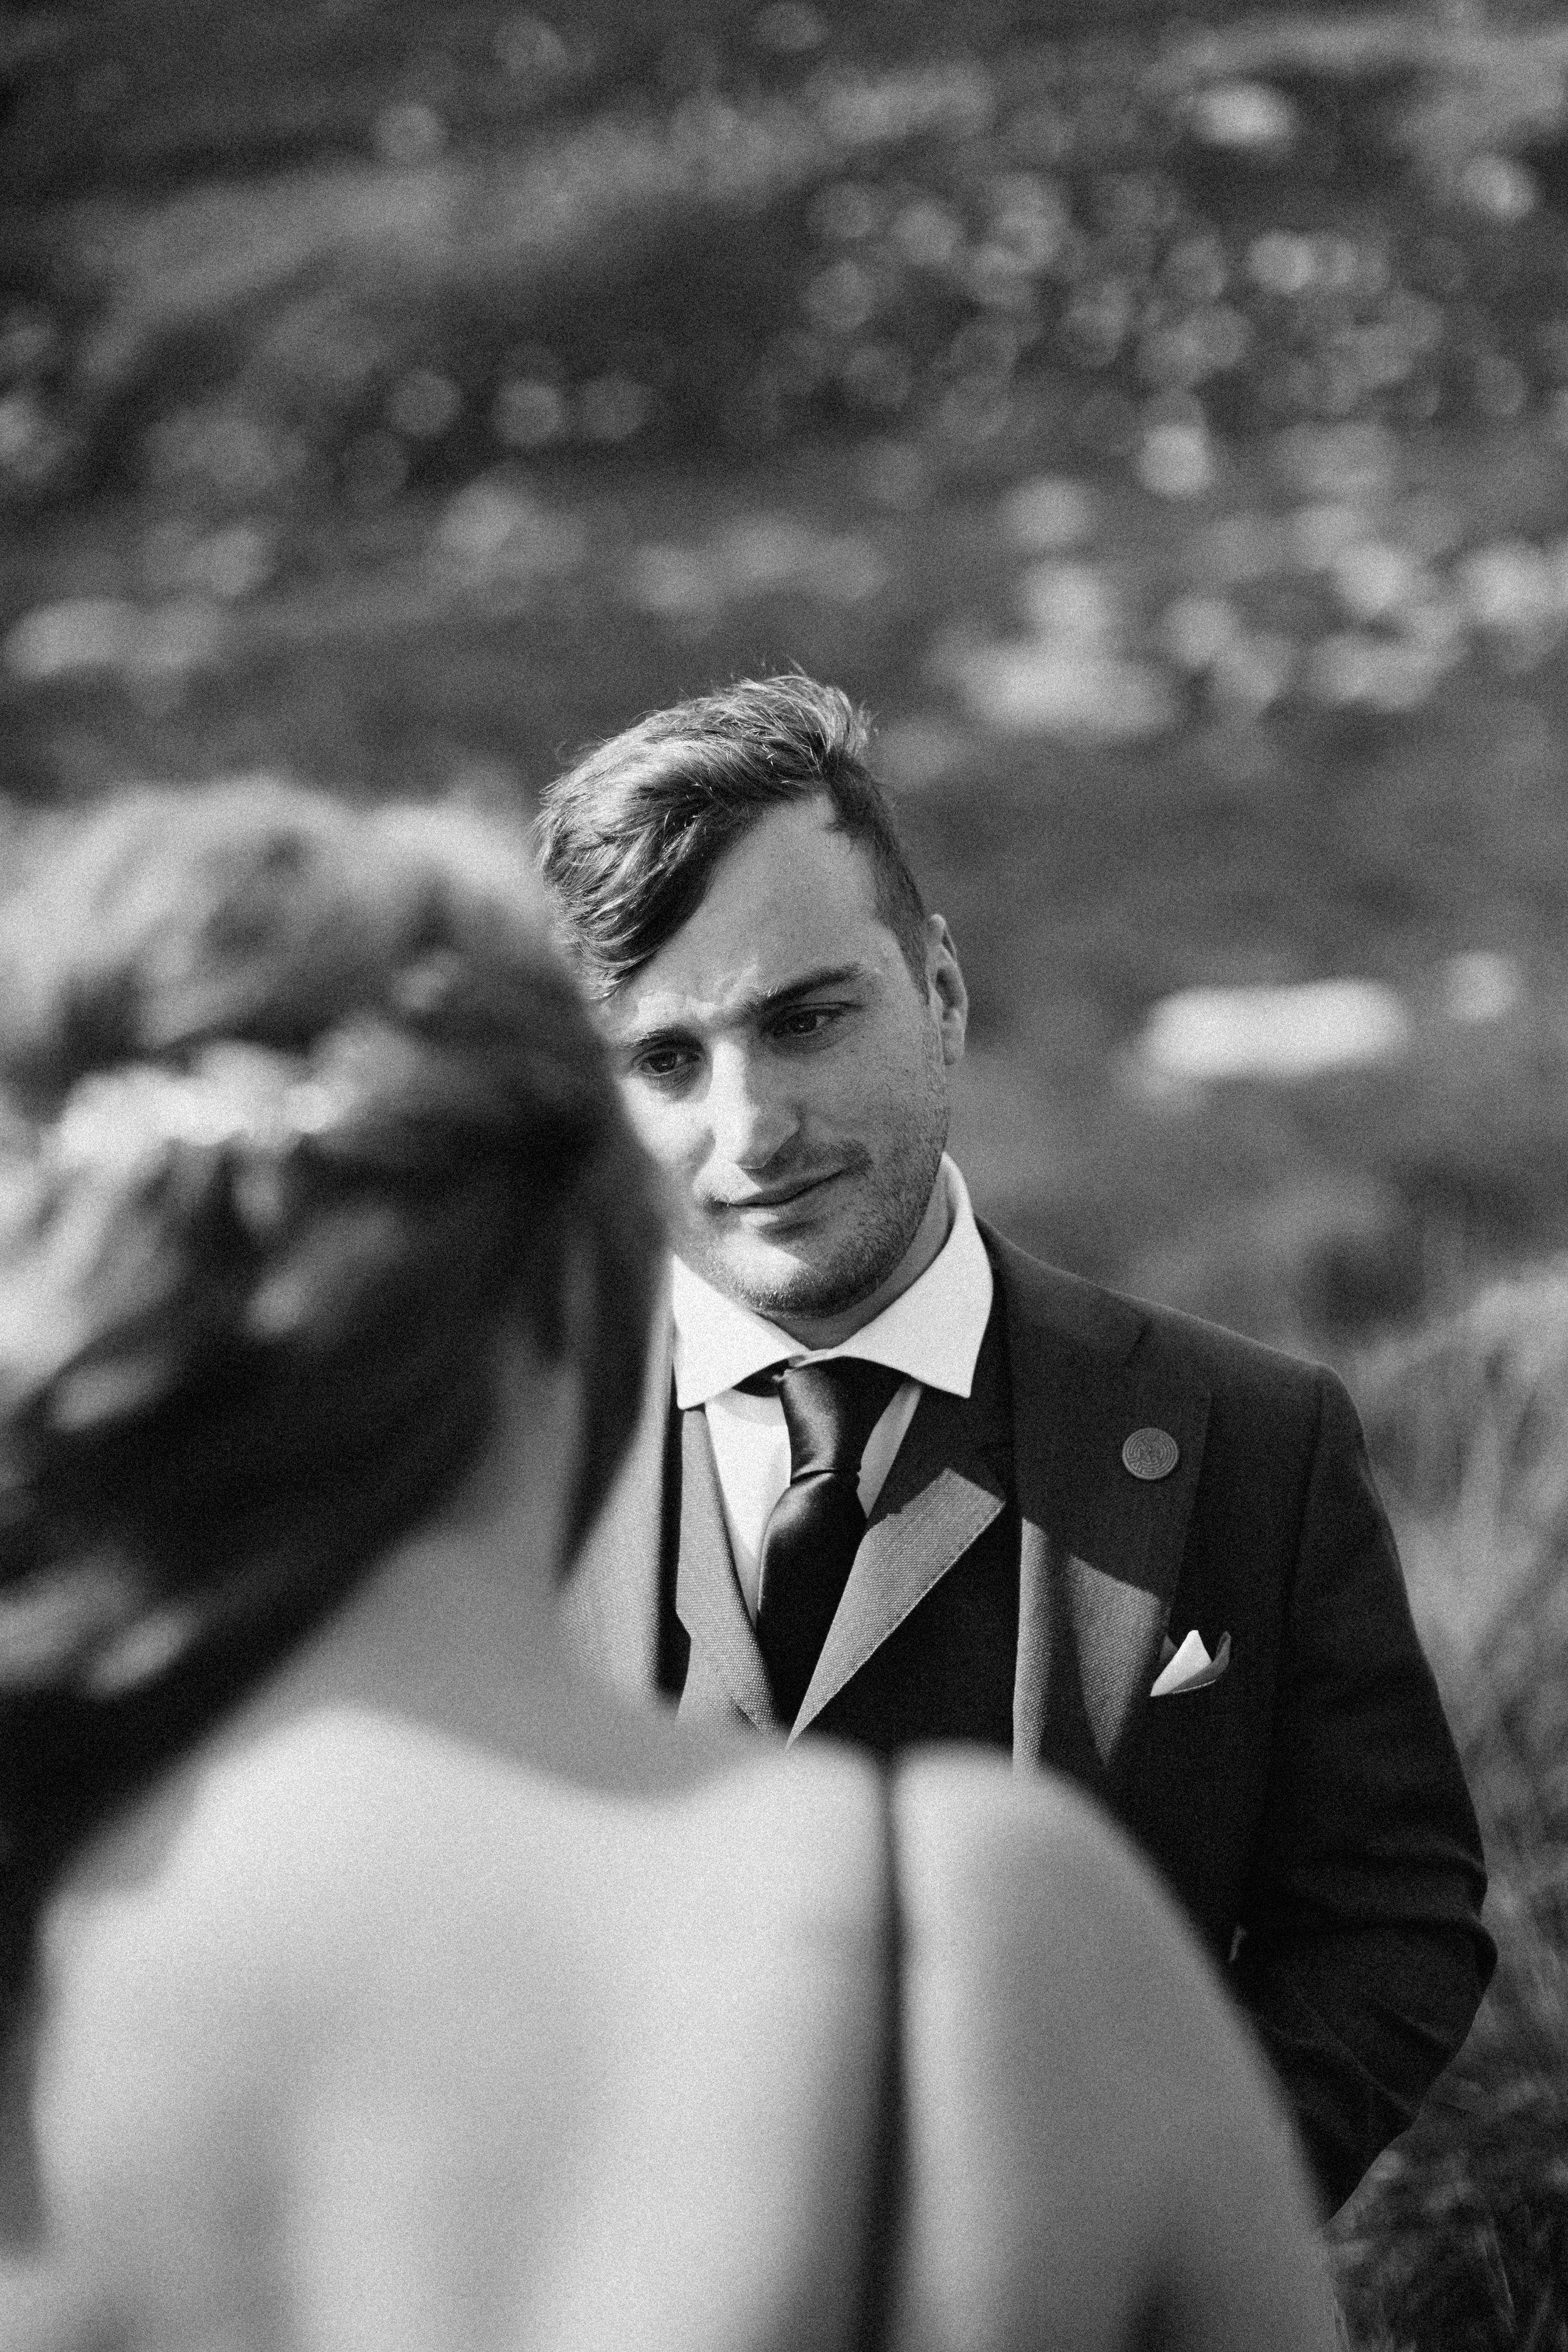 ireland_elopement_black_wedding_dress_wicklow_glendalough_athy_st_kevins_way_1191.jpg